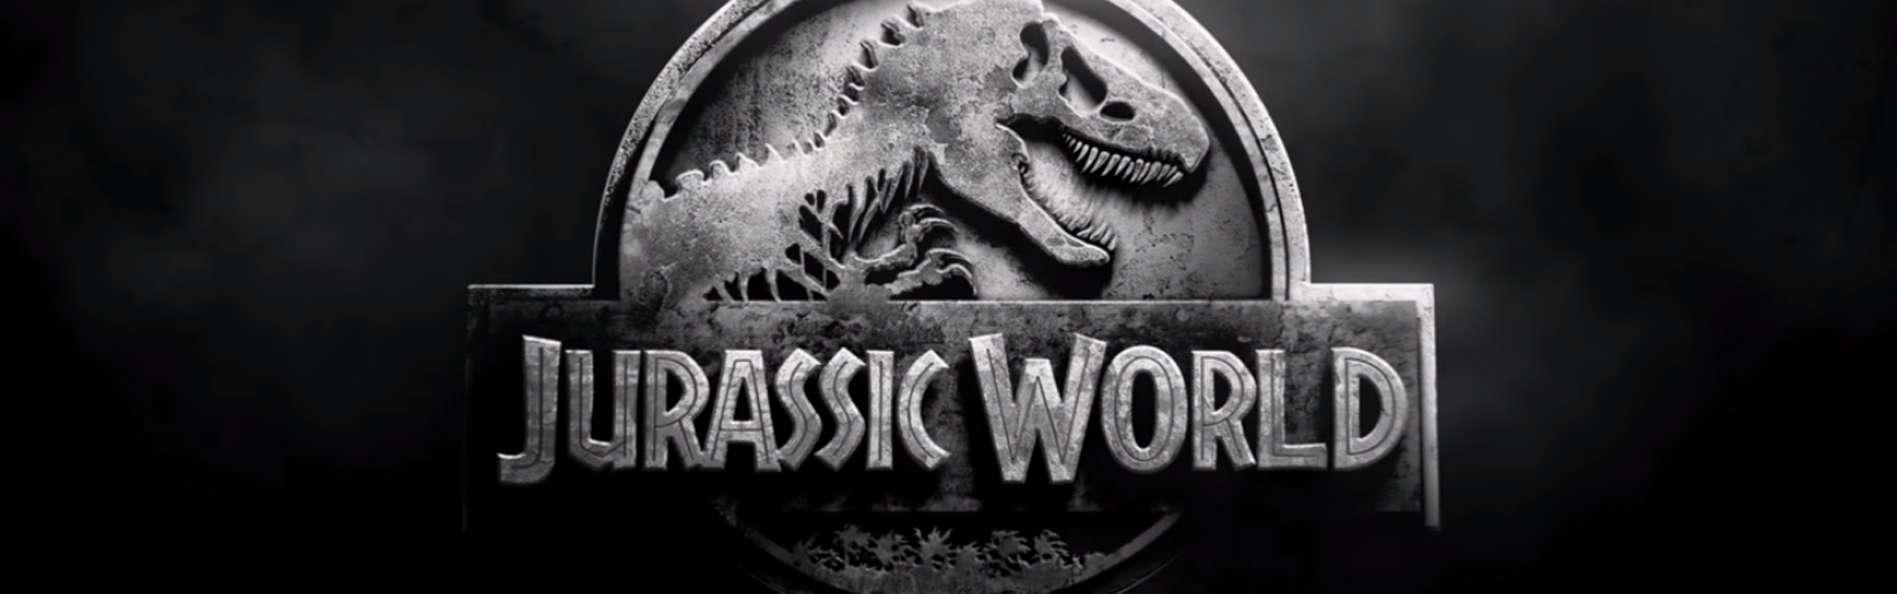 Jurassic World Foto: Universal